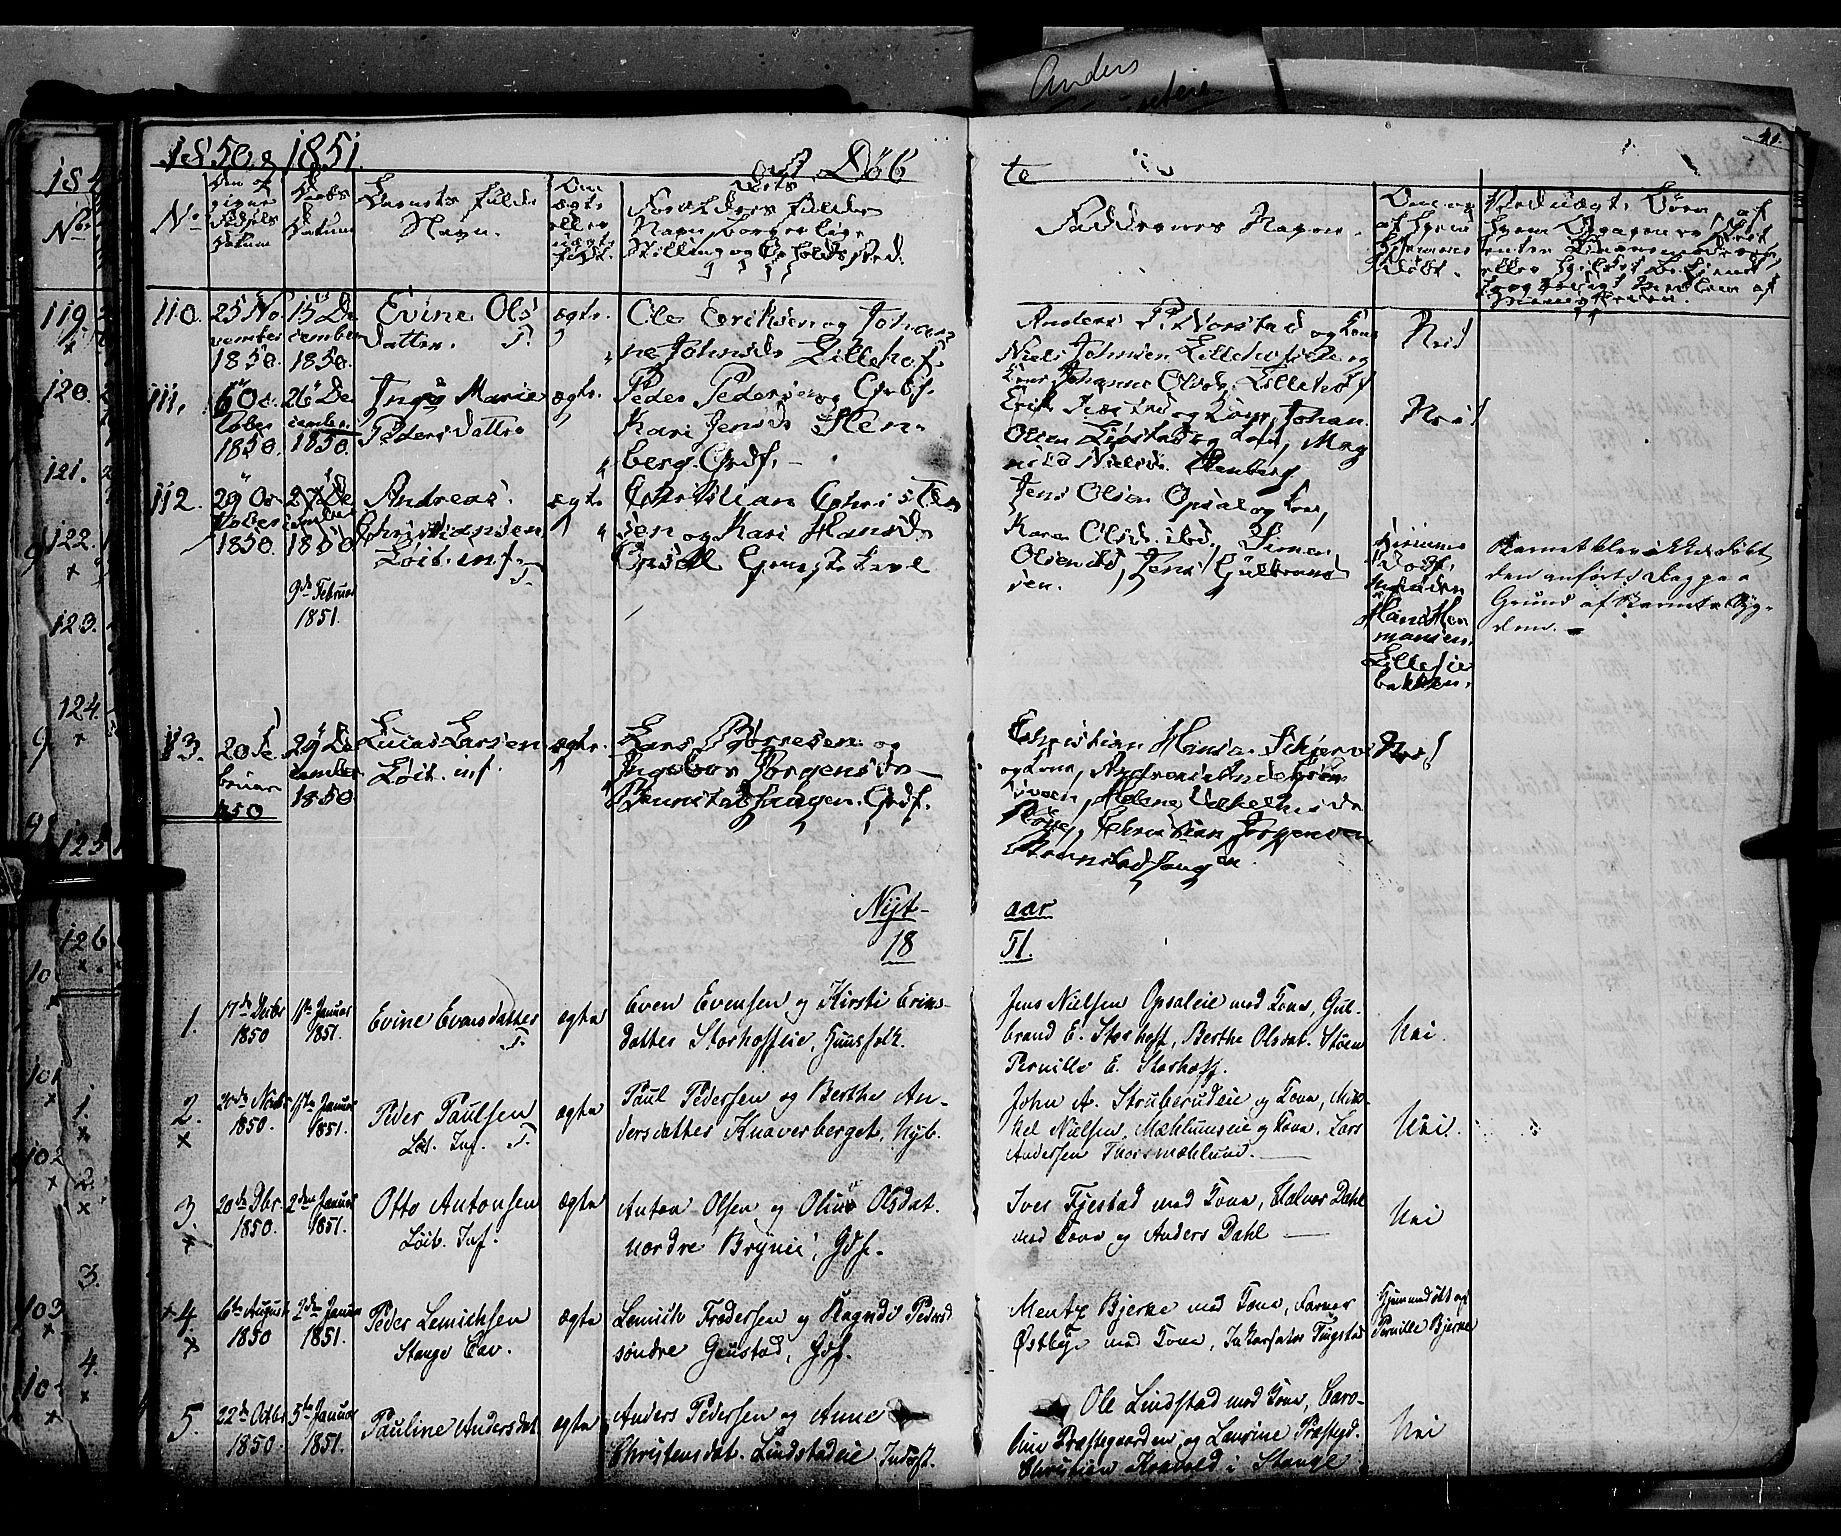 SAH, Romedal prestekontor, K/L0004: Ministerialbok nr. 4, 1847-1861, s. 41